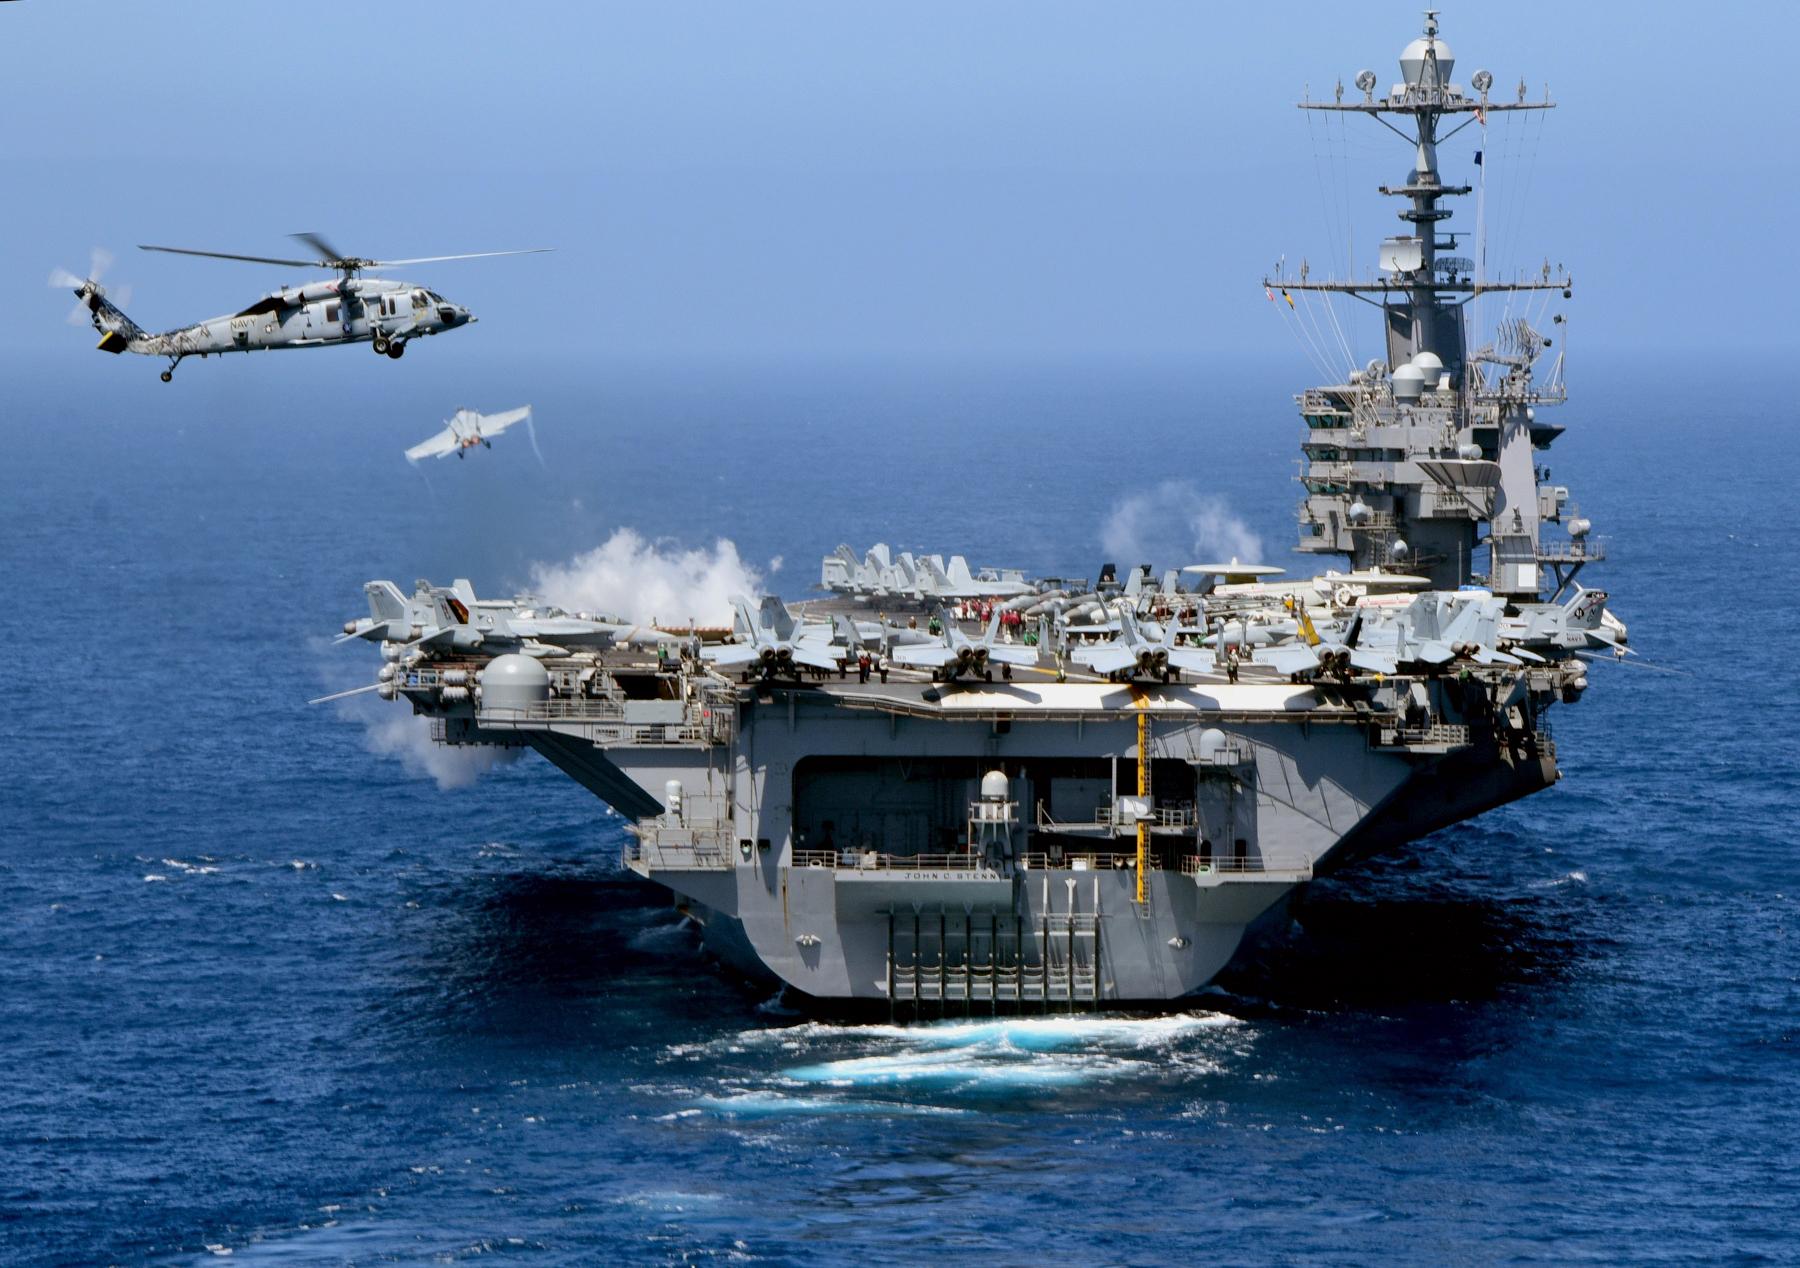 USS JOHN C. STENNIS CVN-74 am 01.05.2015 im Pazifik Bild: U.S. Navy